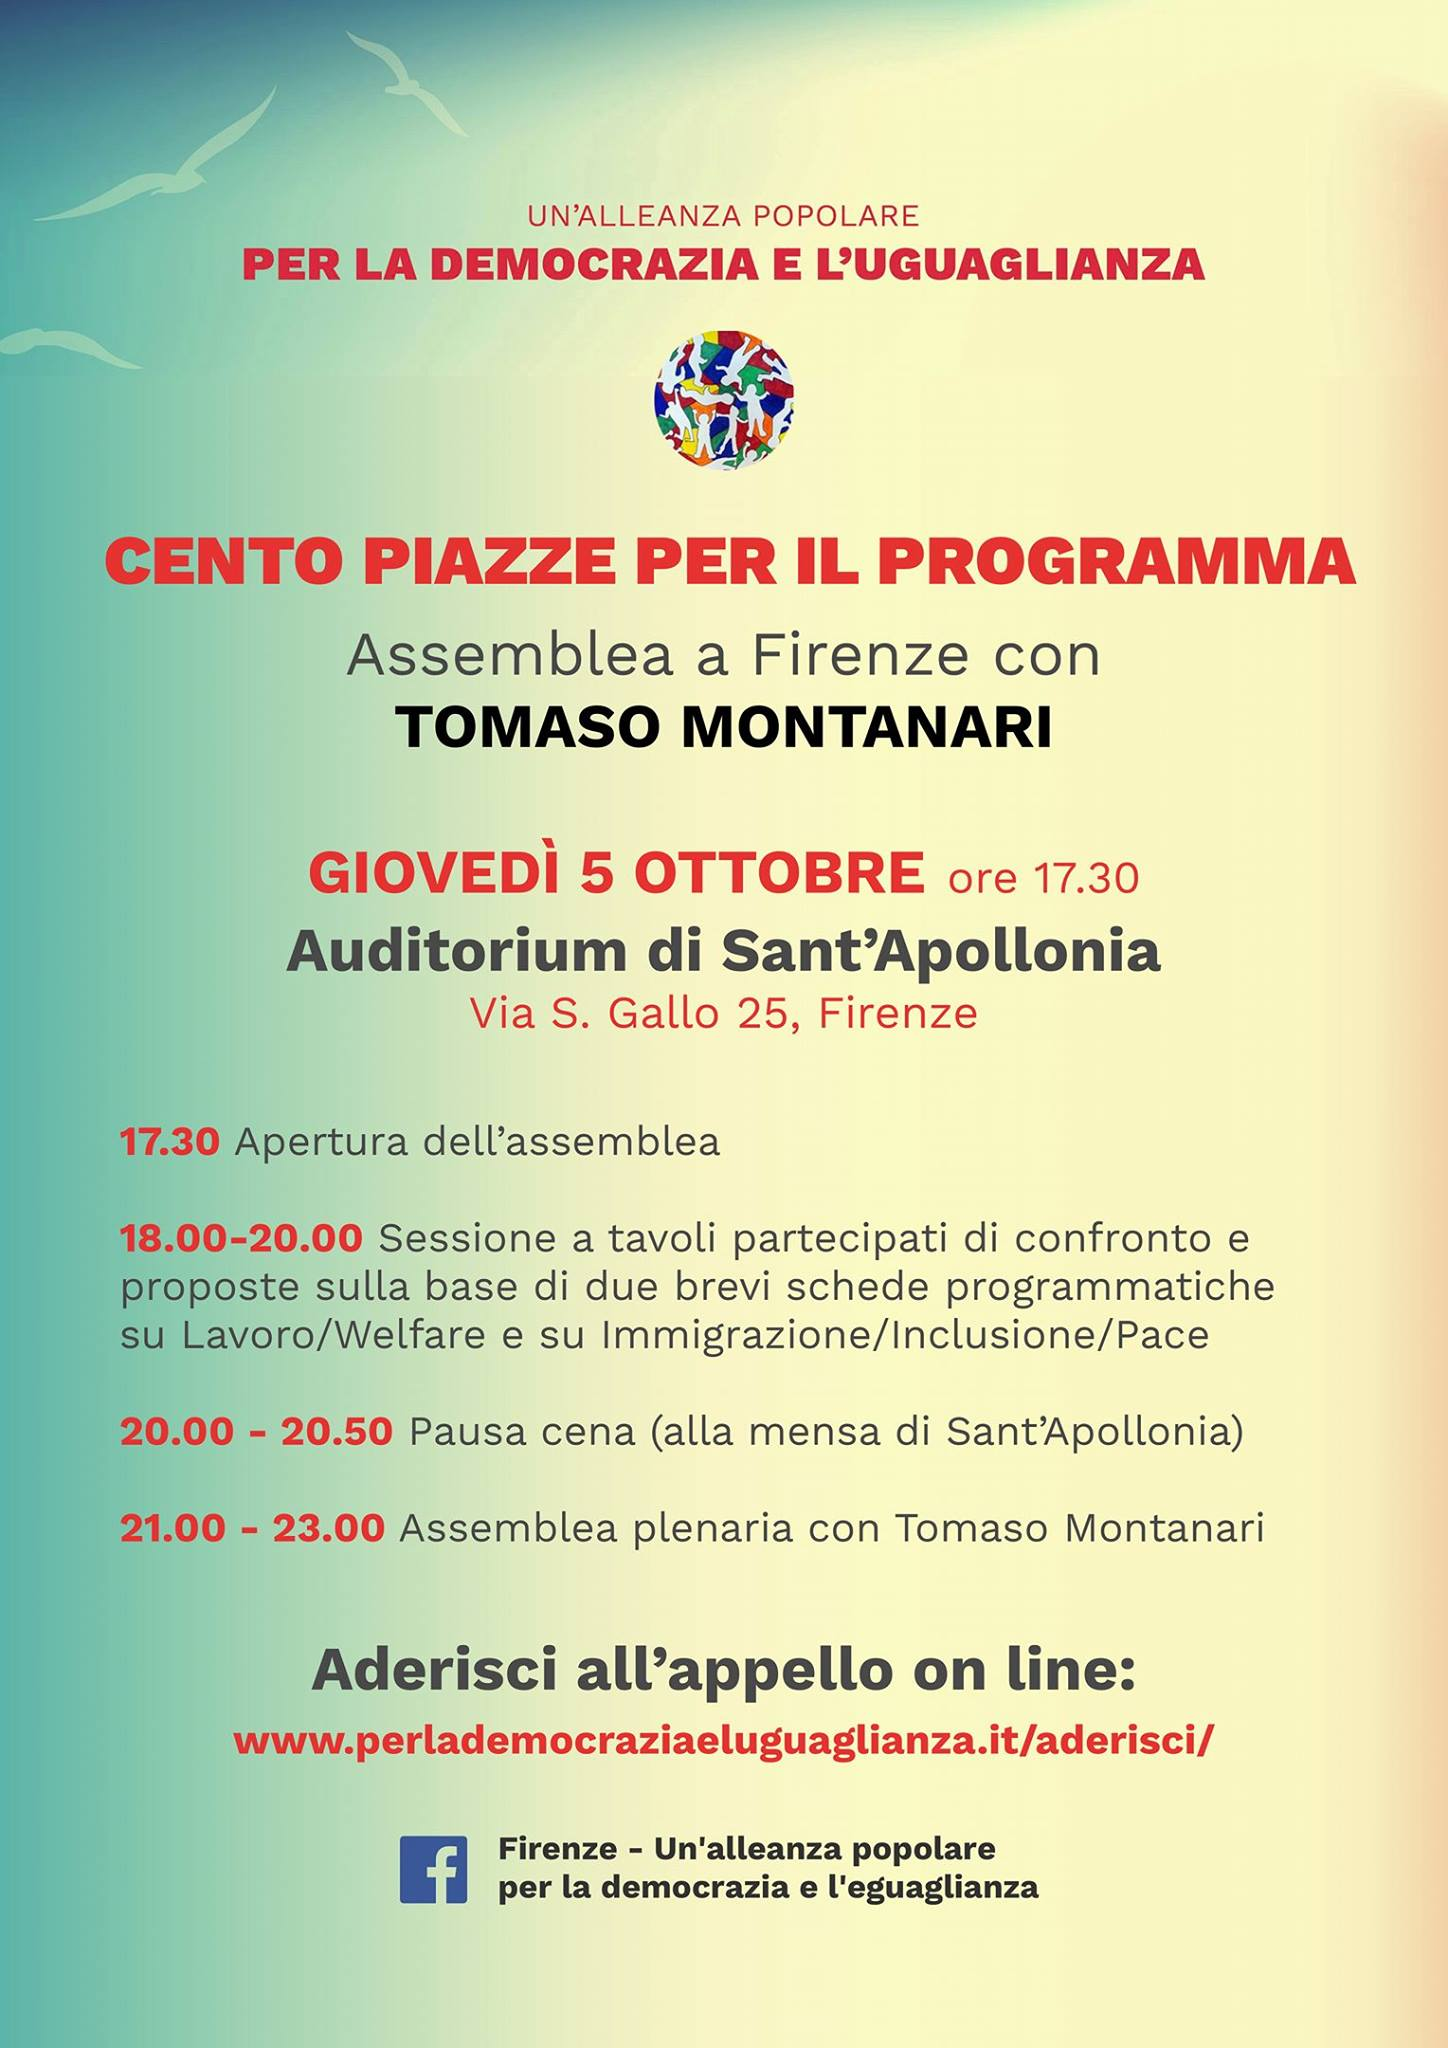 Cento Piazze: assemblea a Firenze @ Auditorium di Sant'Apollonia   Firenze   Toscana   Italia